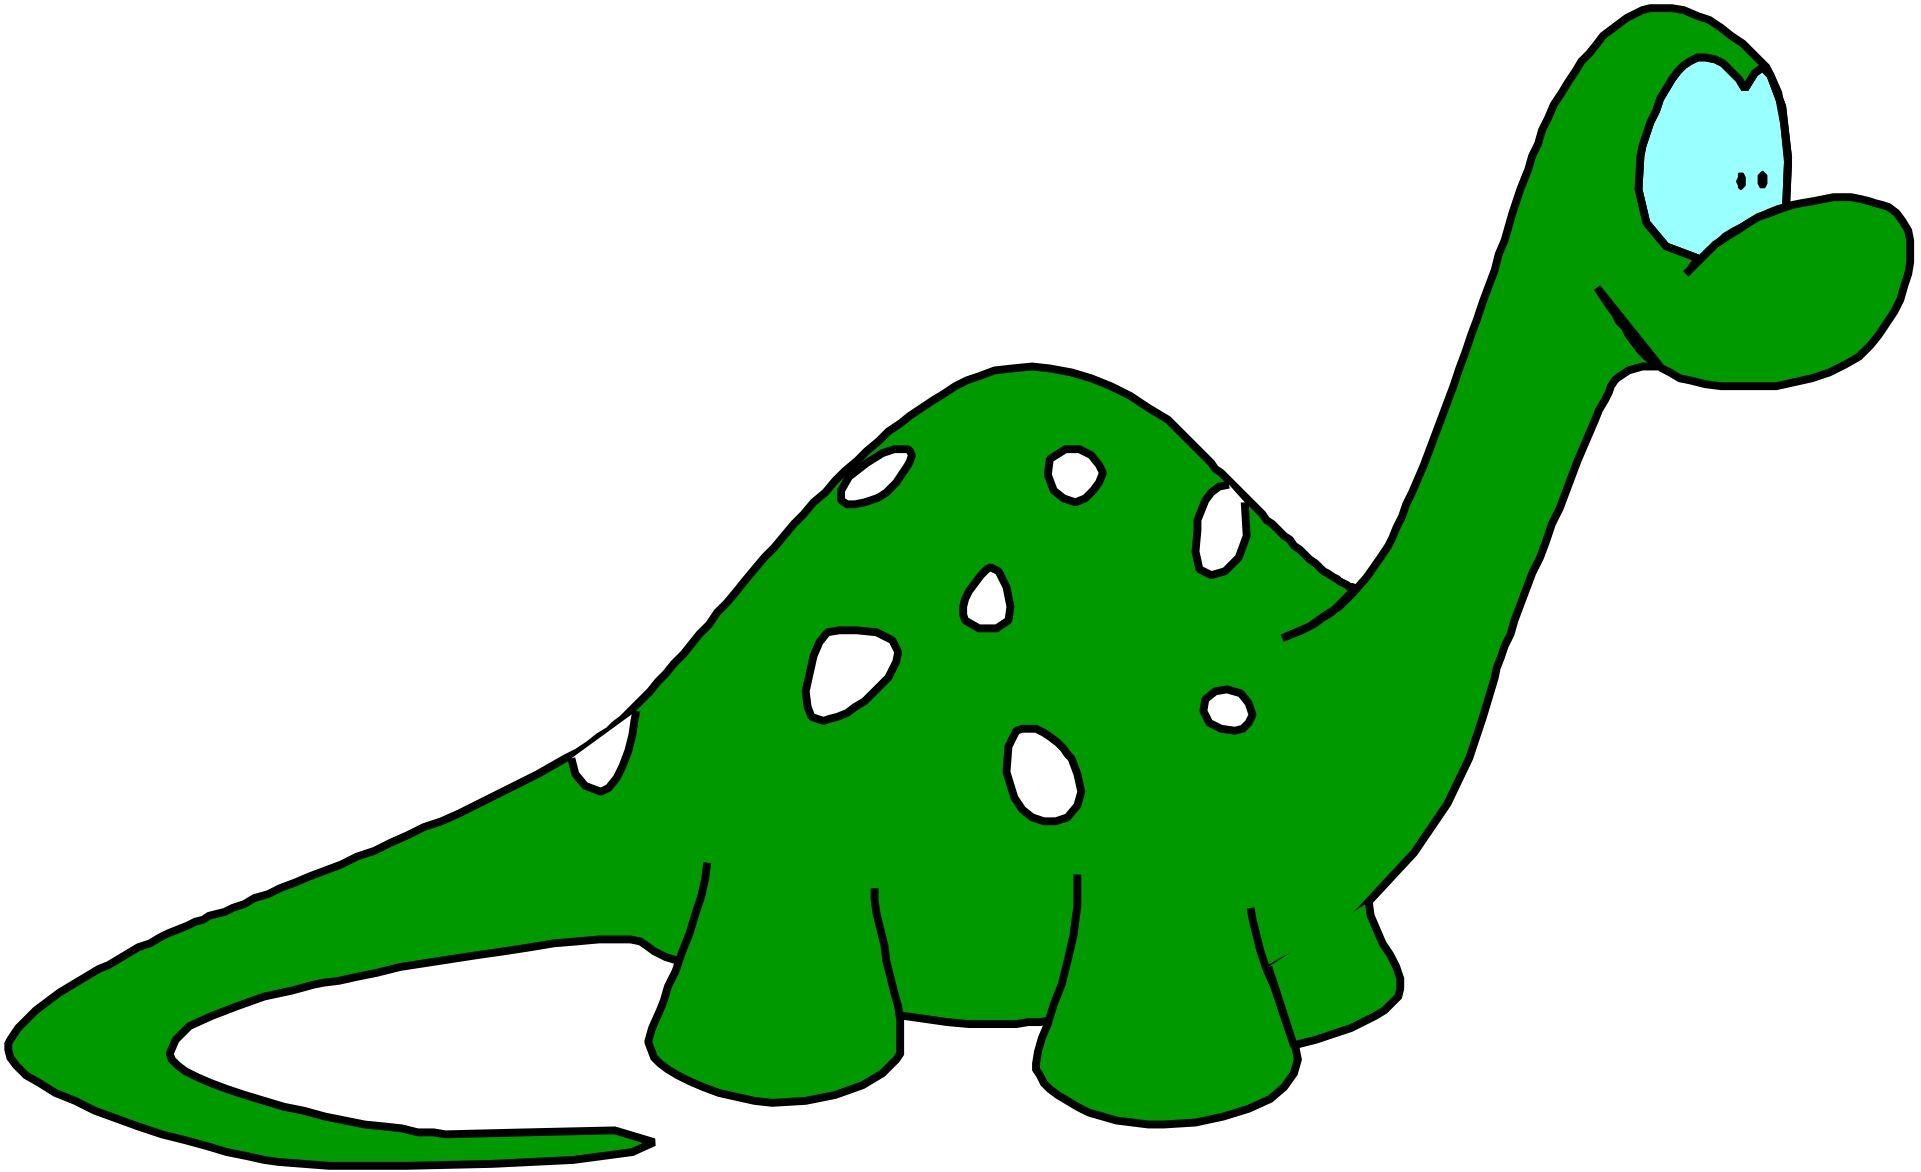 Clipart dinosaur dinosaur extinction. Cartoon panda free images